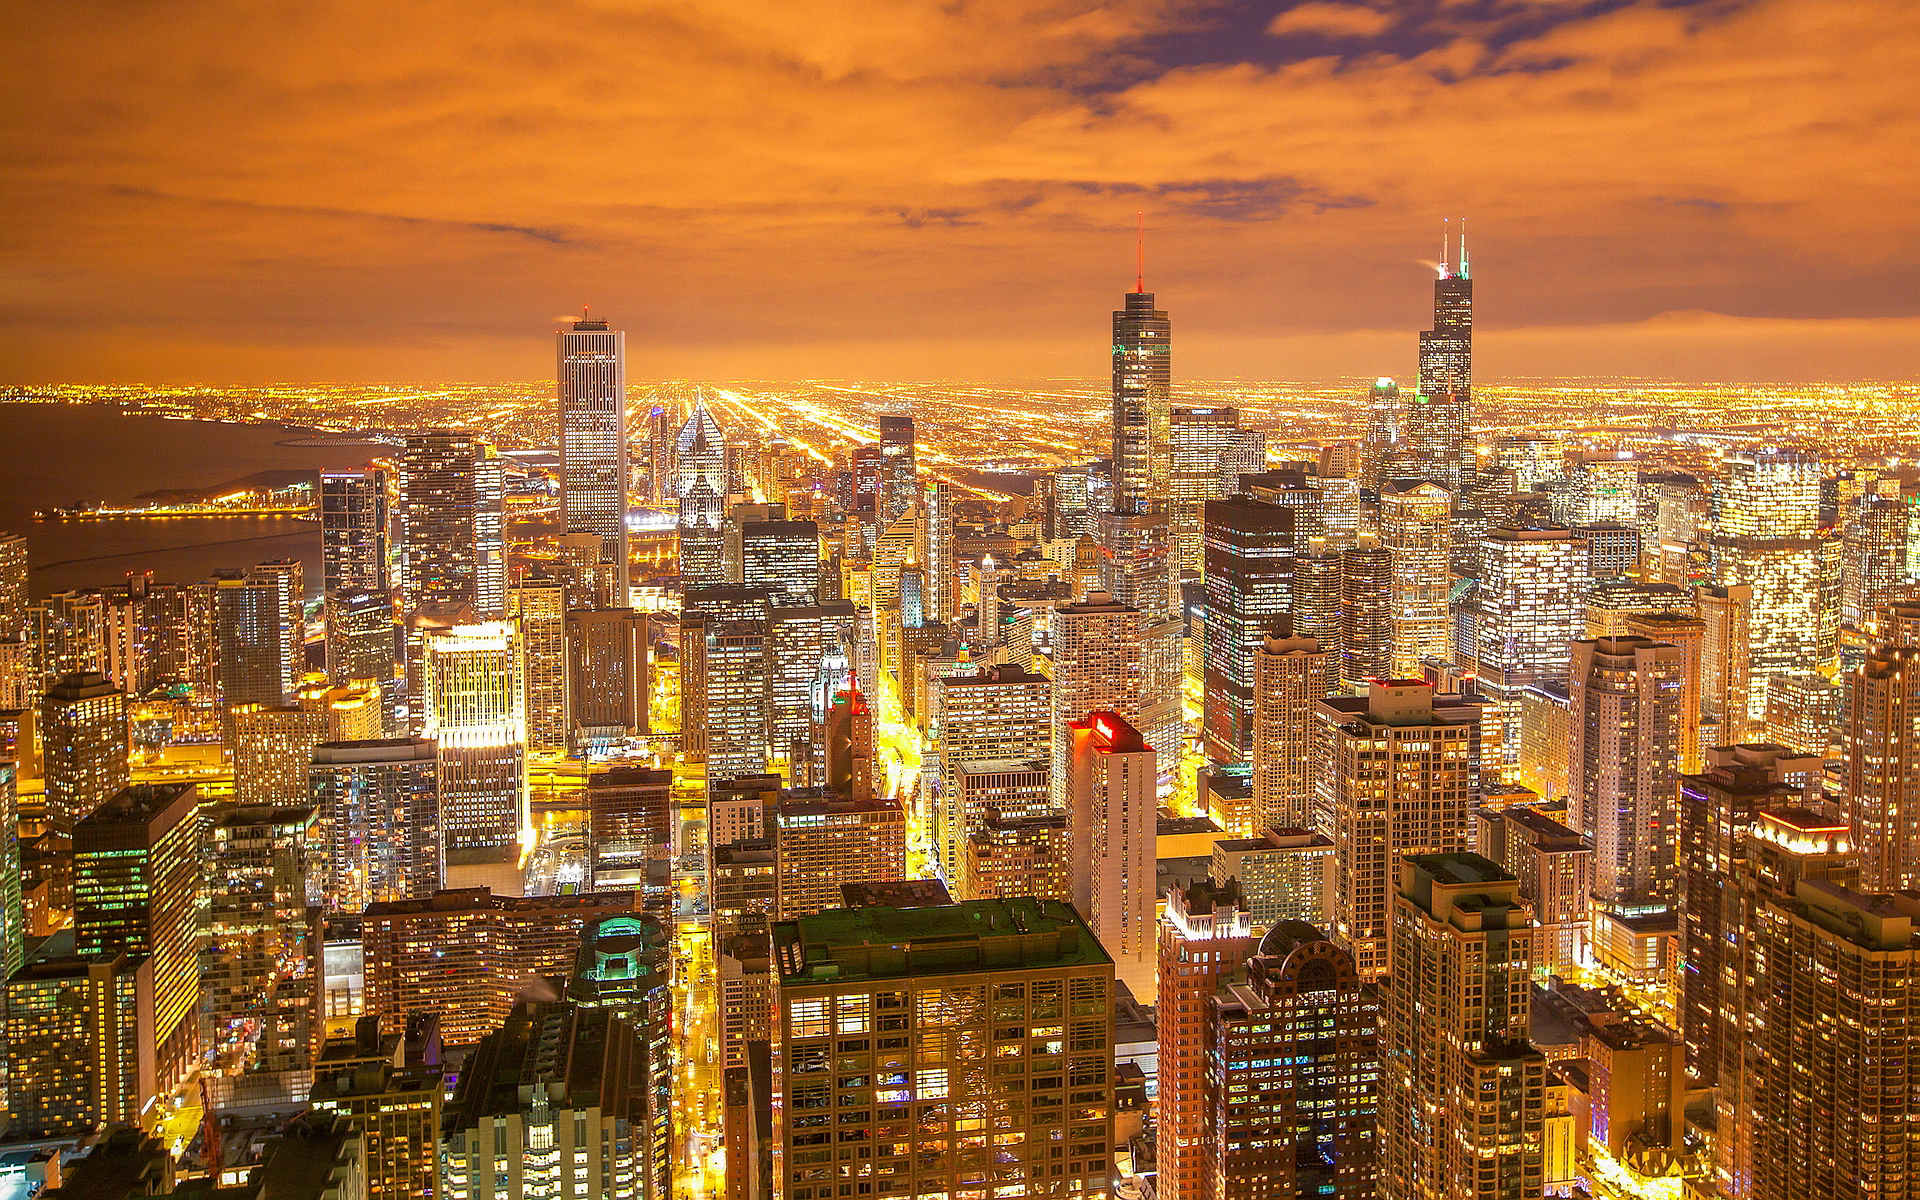 Chicago night city view